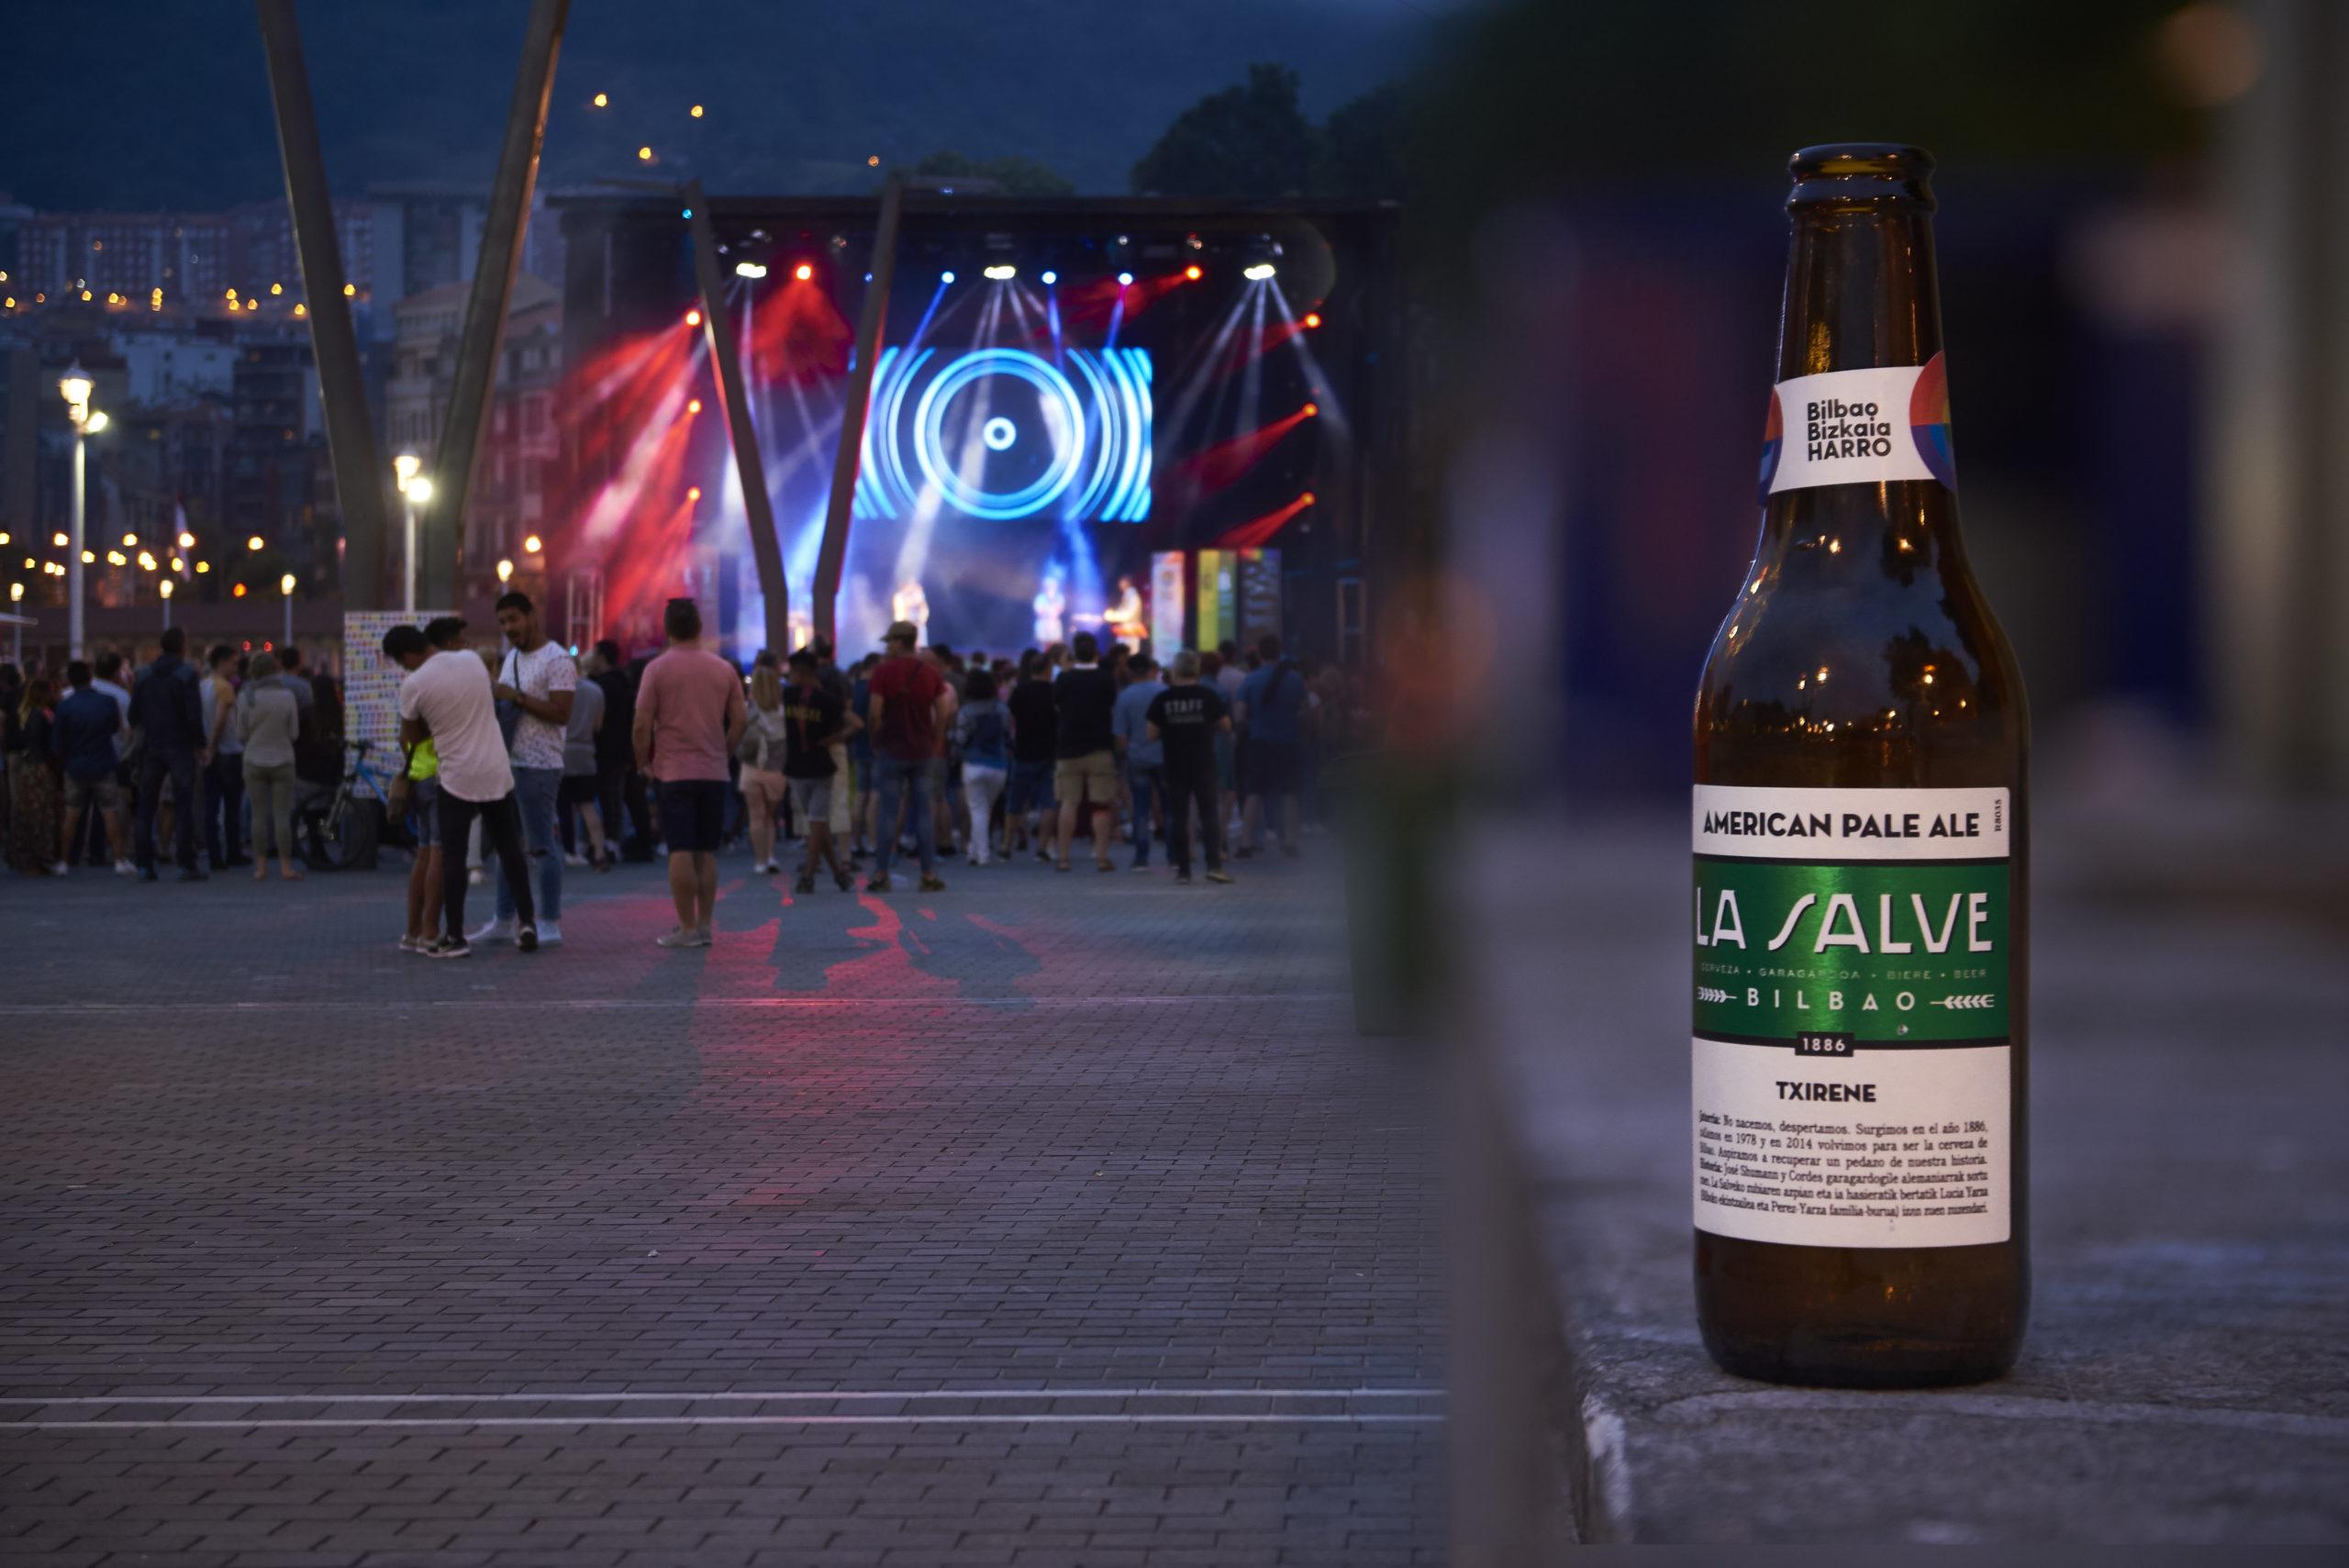 Bilbao Bizkaia HARRO 2019